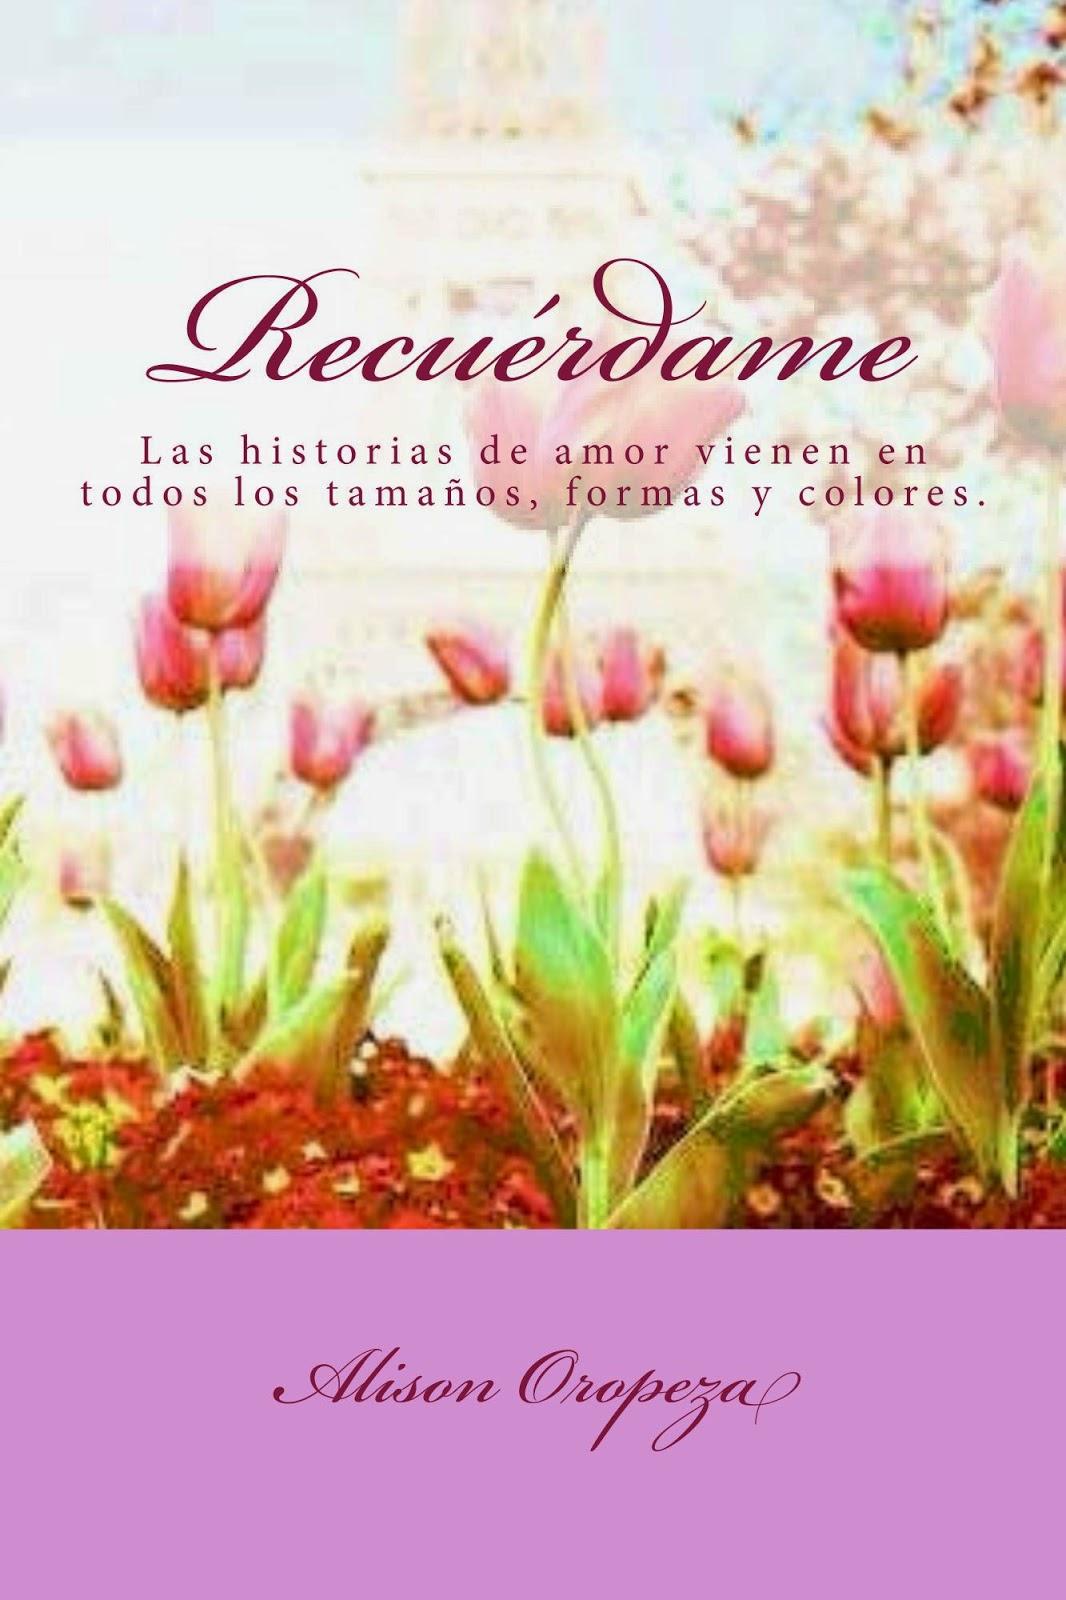 oropeza - Recuérdame, Recuérdame 01  - Alison Oropeza (Rom) Recu%C3%A9rdame_Cover_for_Kindle